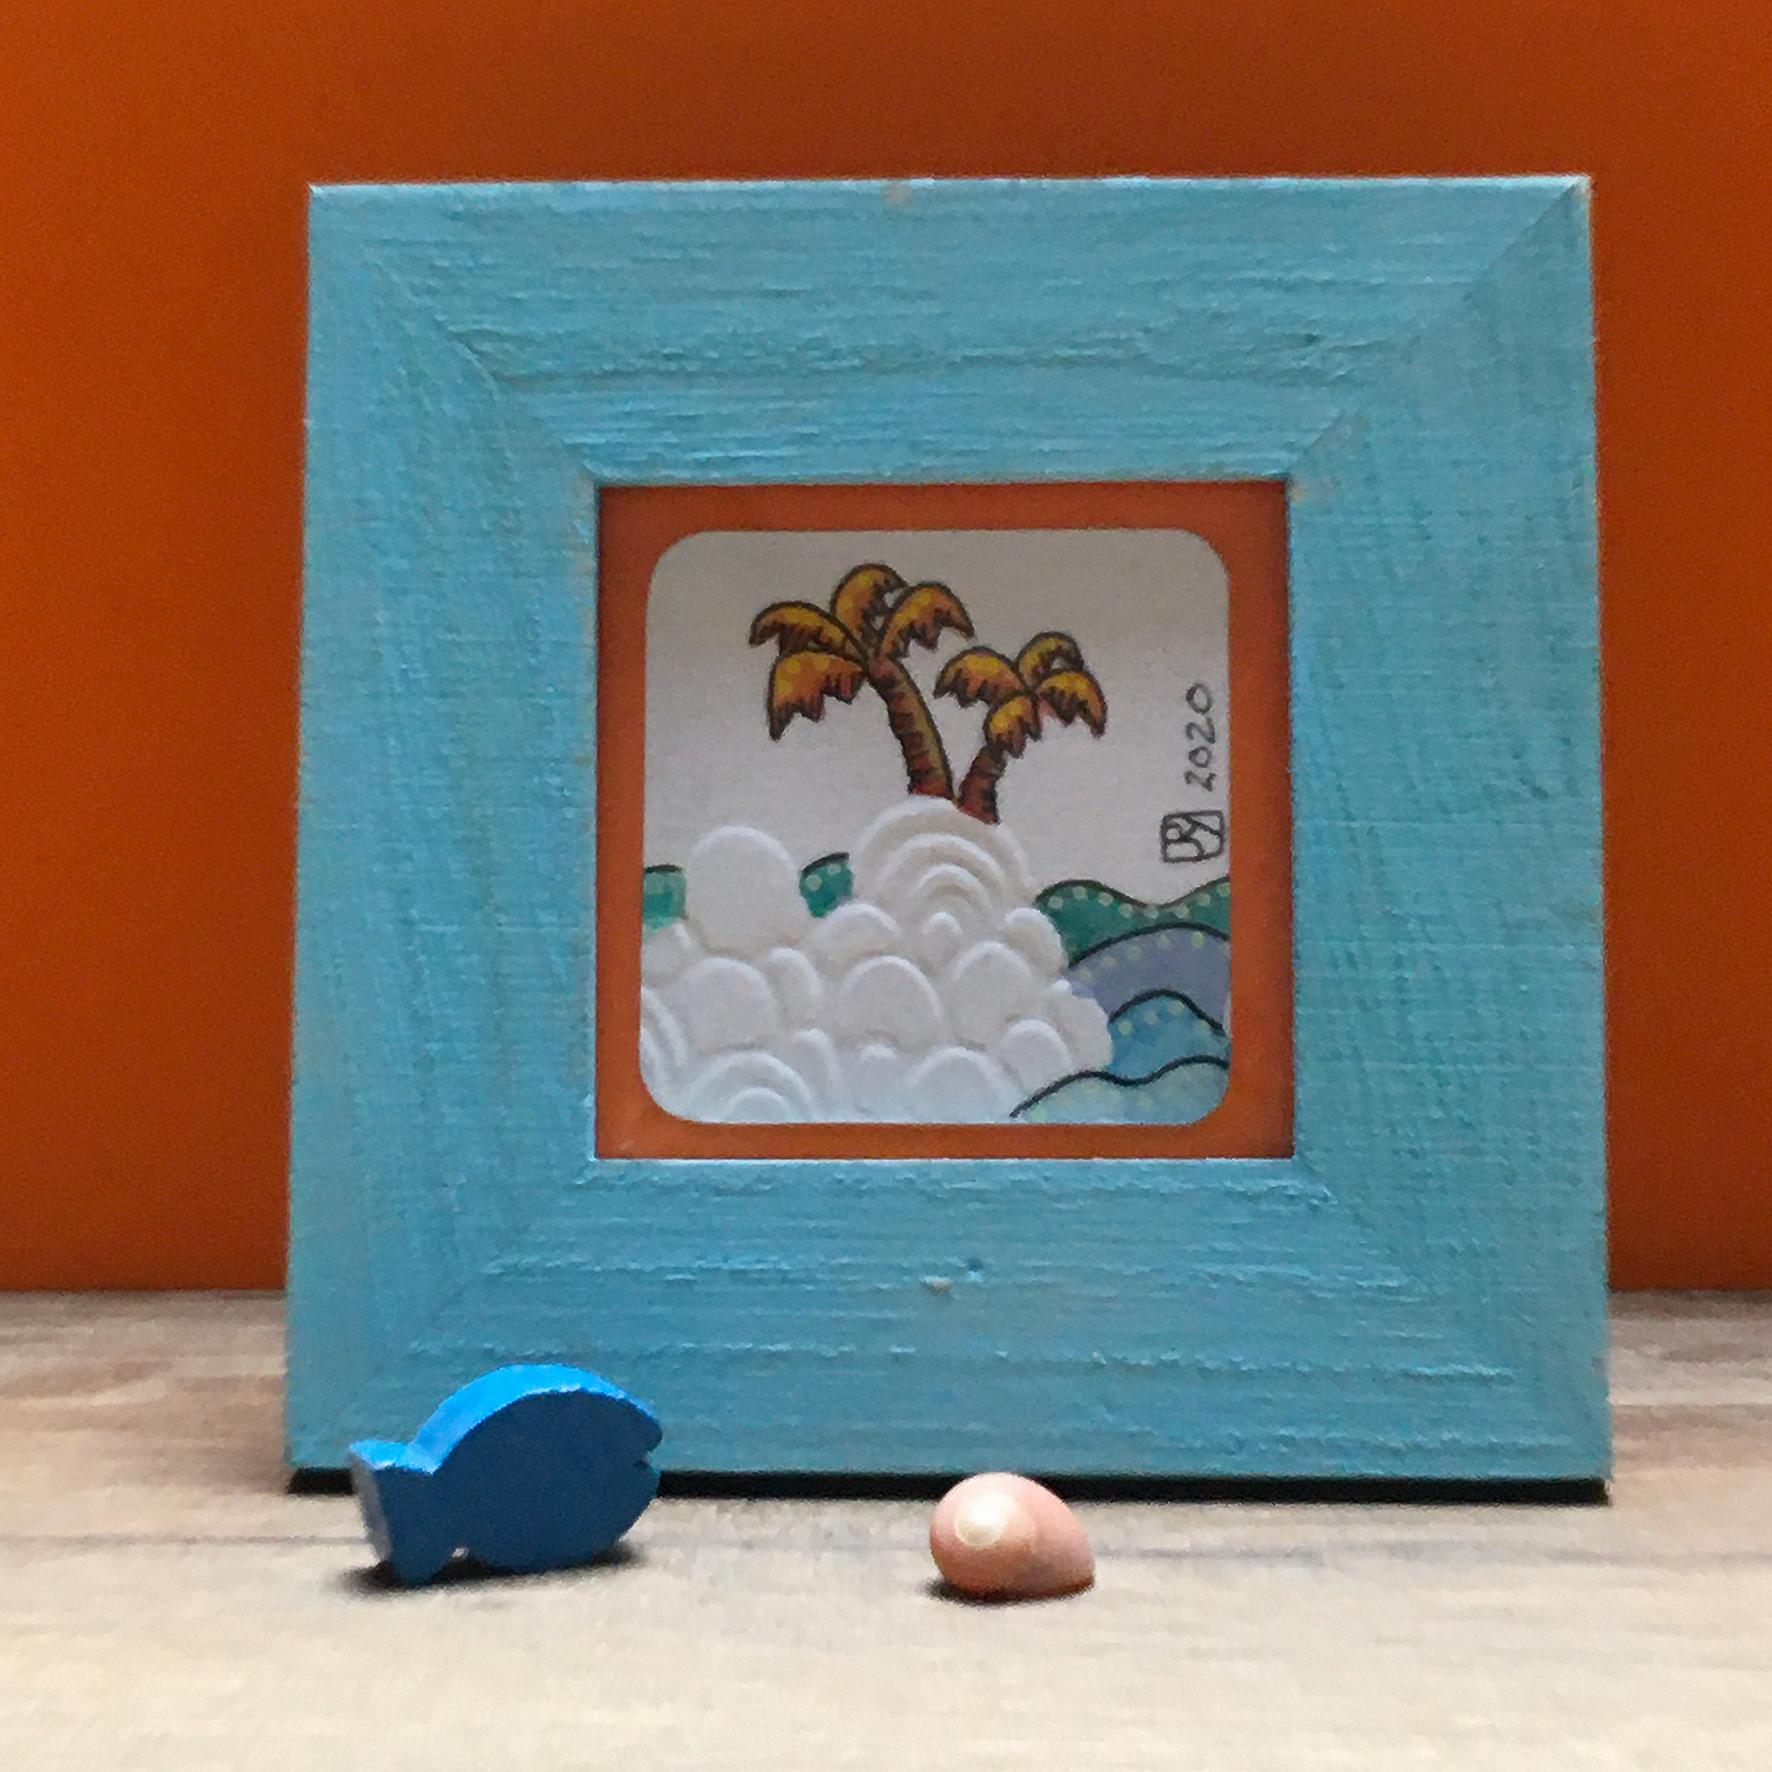 """Odyssée 3"" ©Julia Ratsimandresy / Mini-aquarelle encadrée / Cadre bois bleu+verre 10x10 cm / 15€ hors fdp / Exemplaire unique!"